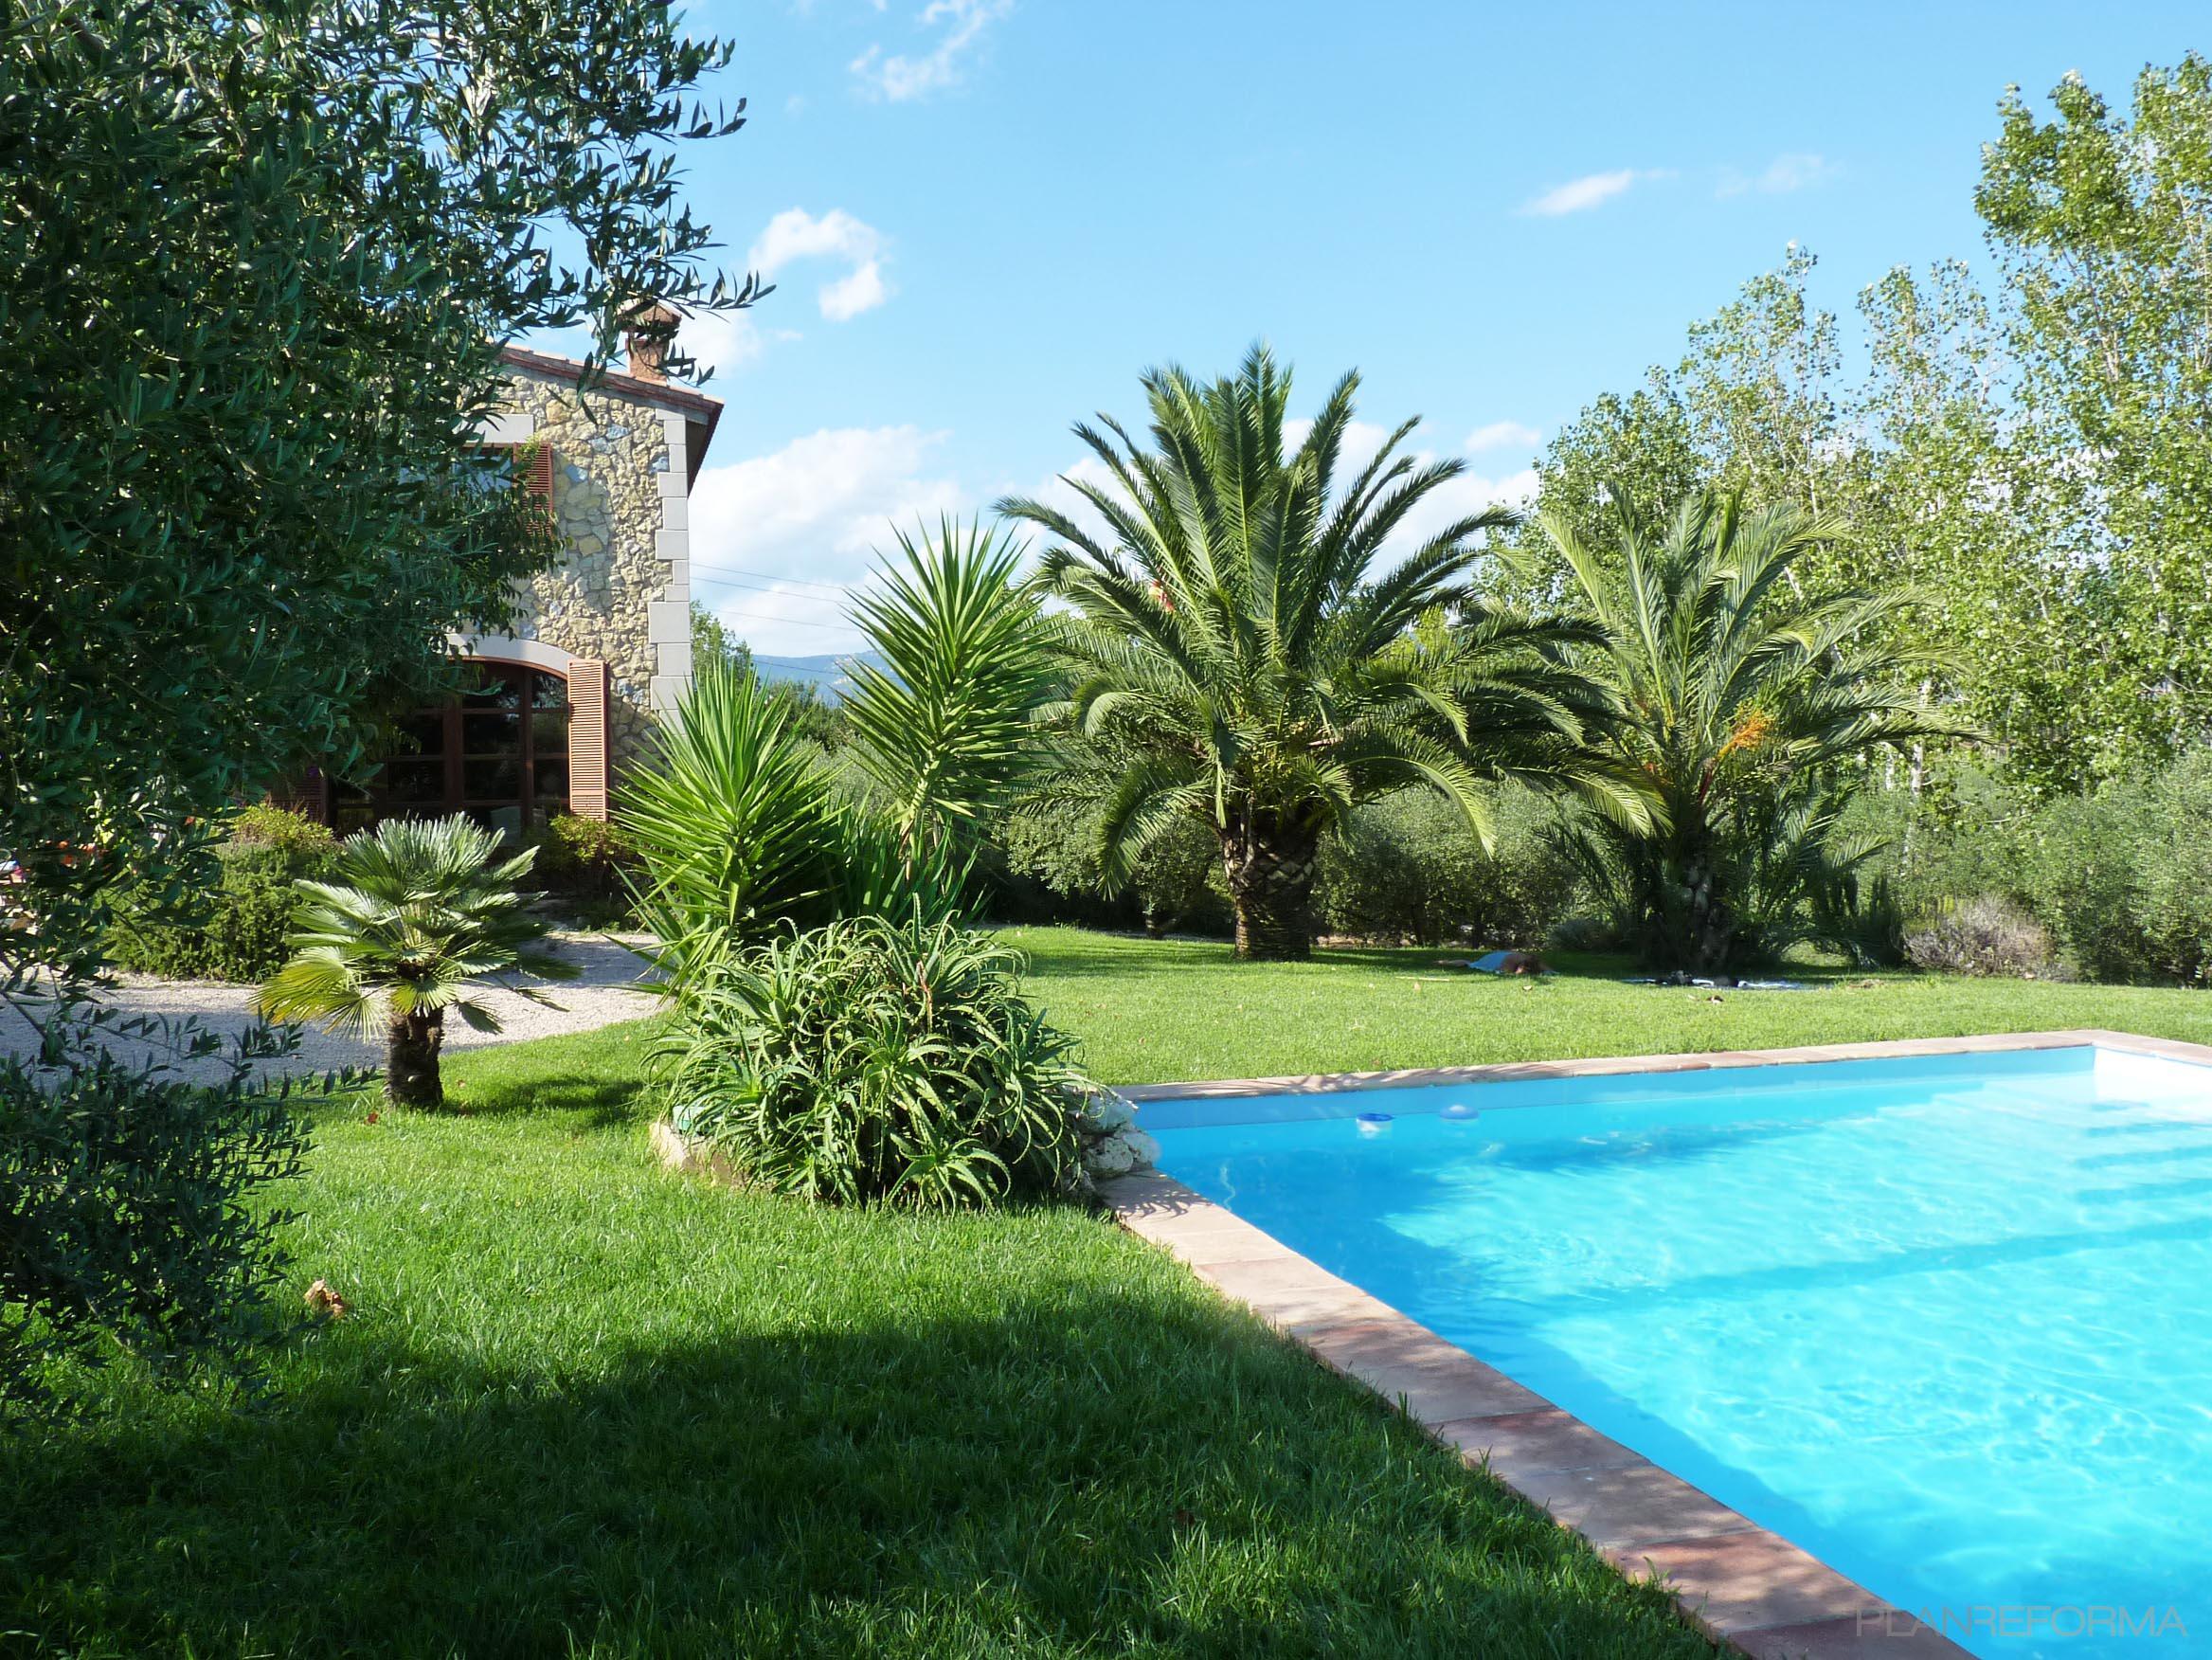 Piscina exterior jardin estilo mediterraneo color verde for Ideas piscinas jardin